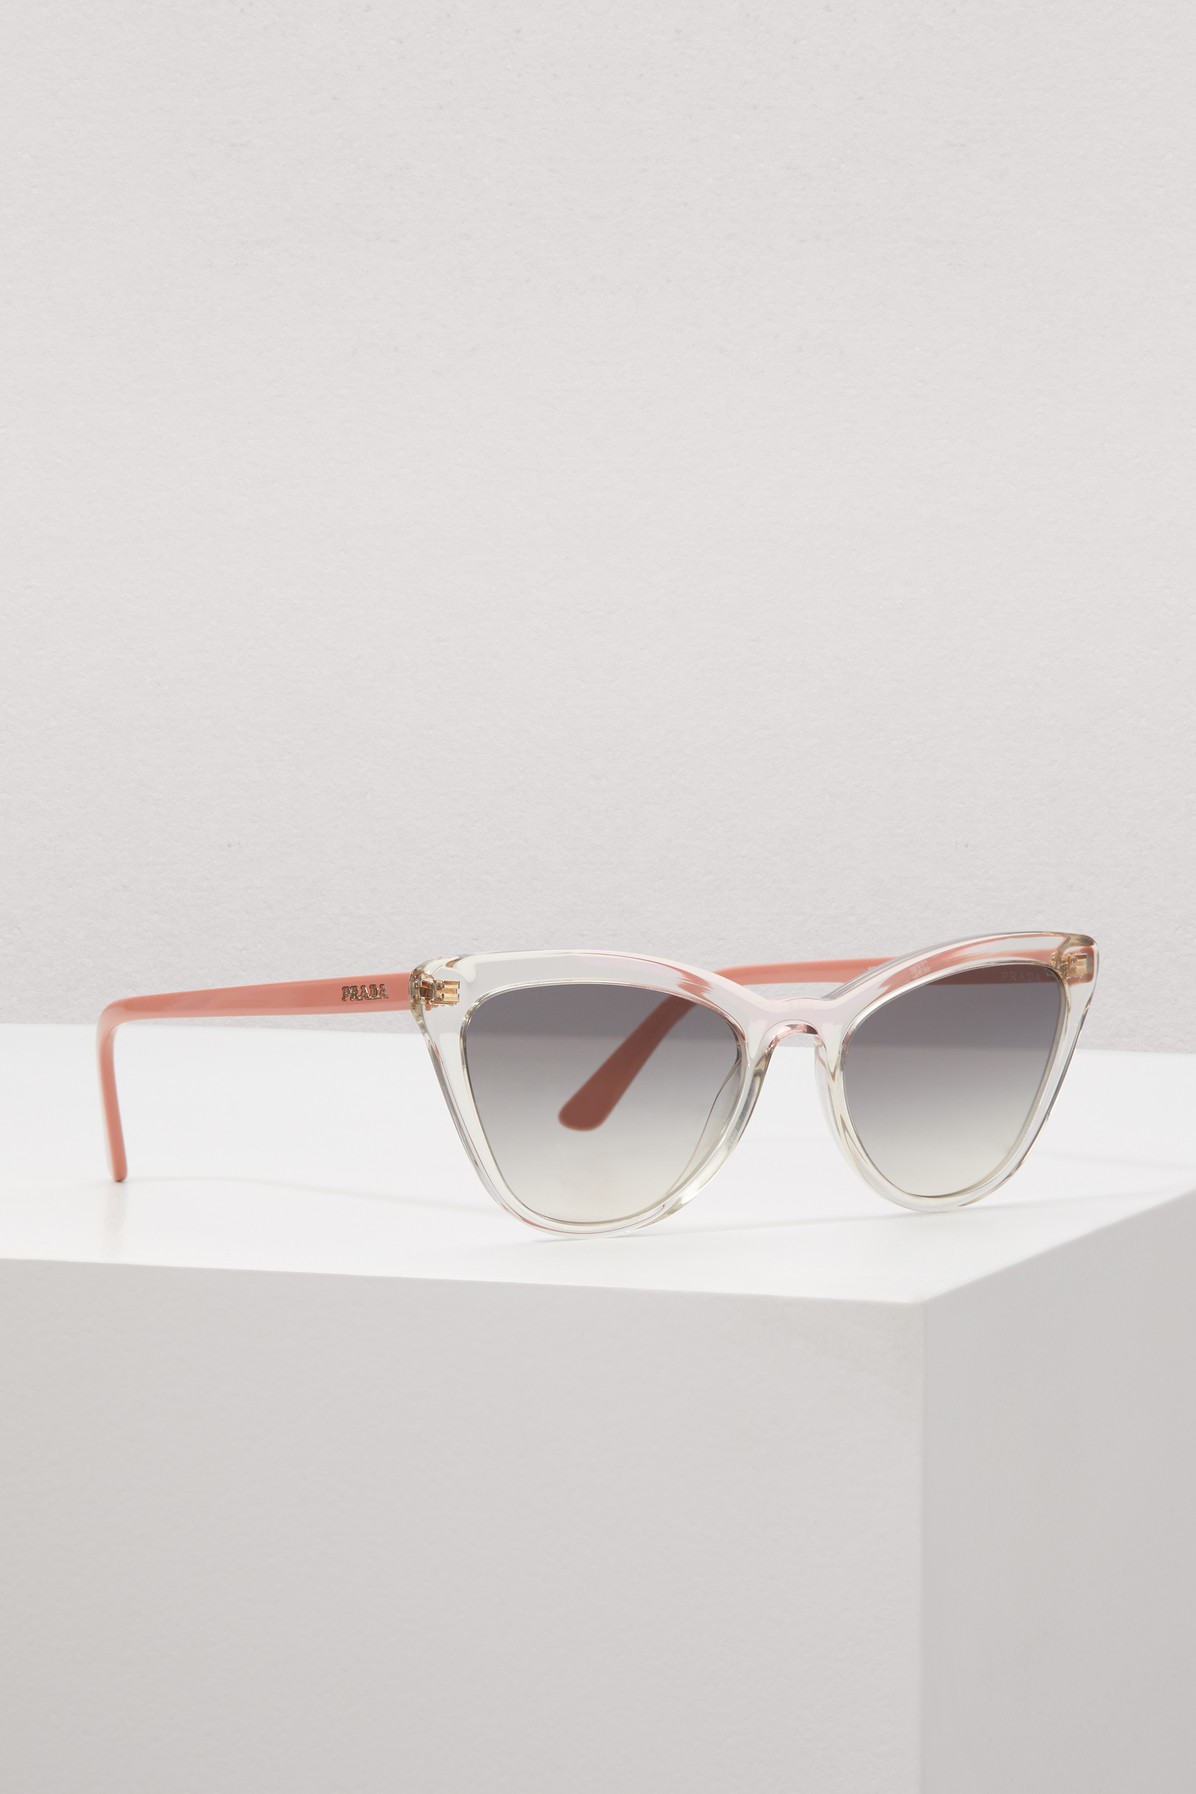 7d4511d1c0fc Prada Sunglasses